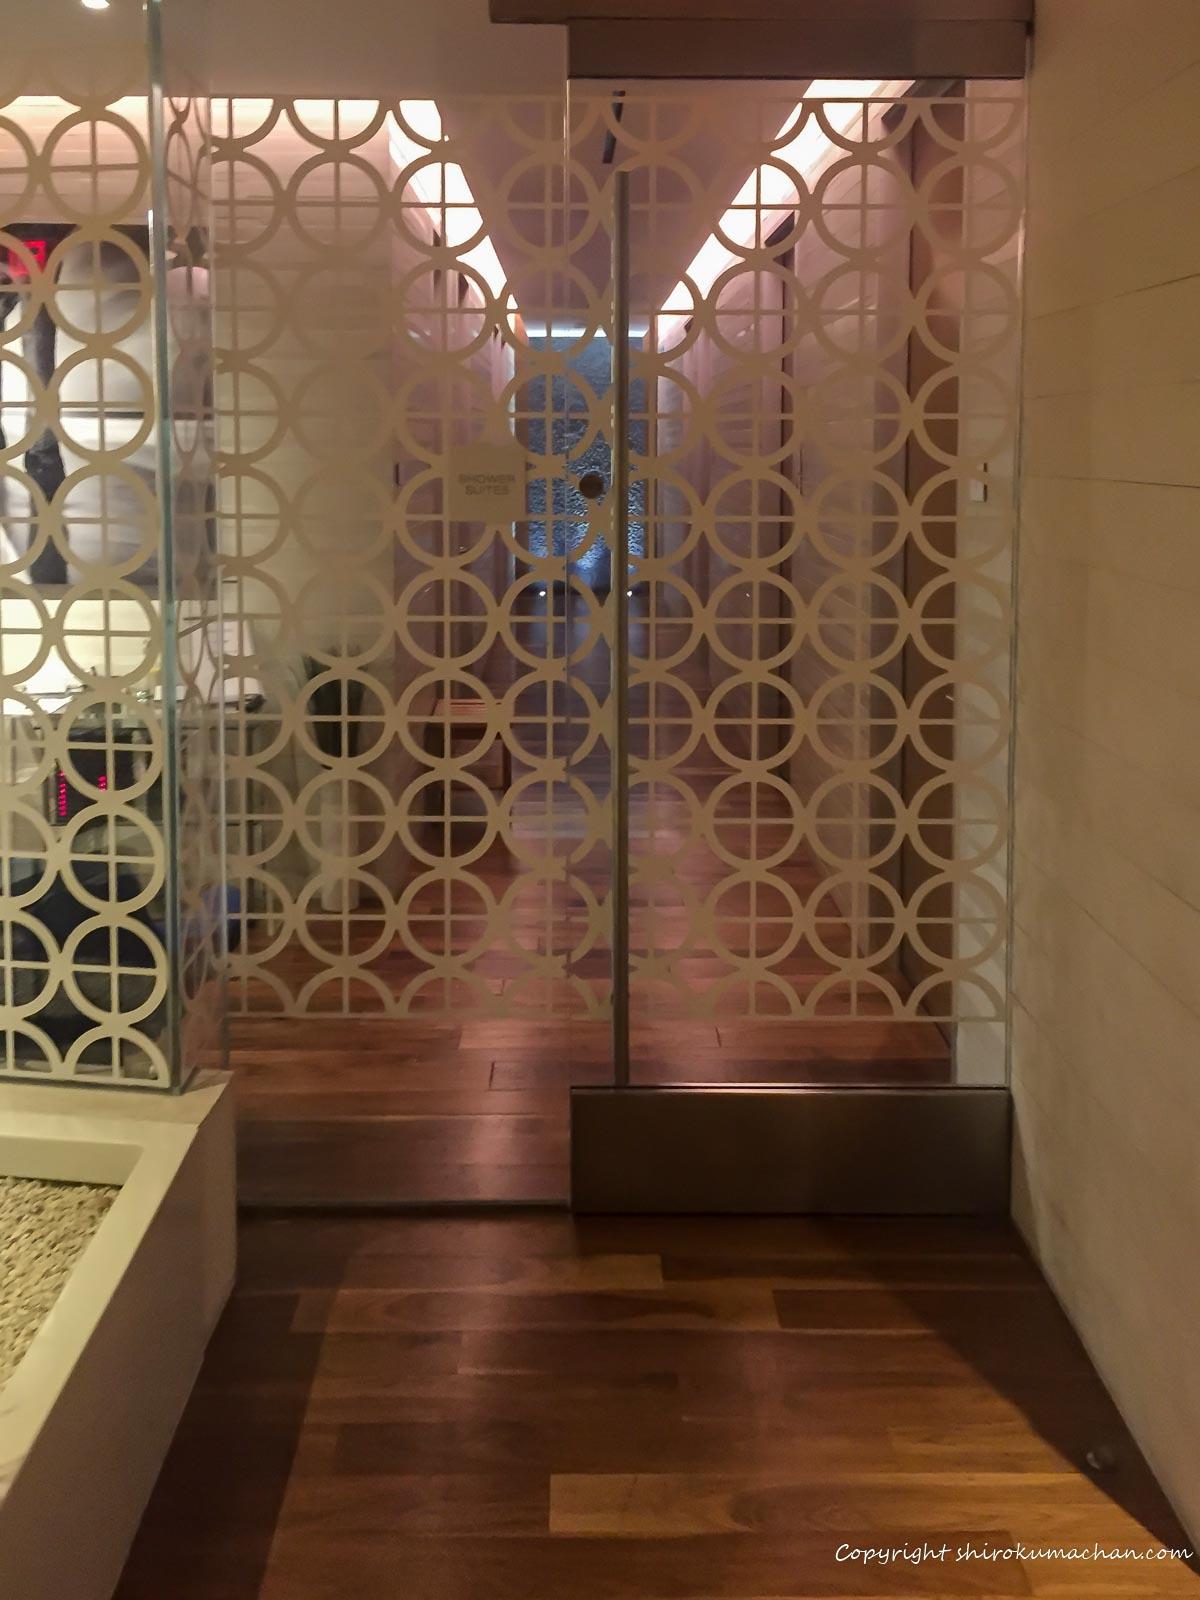 ANAビジネスクラスラウンジロサンゼルス空港のシャワールーム入り口